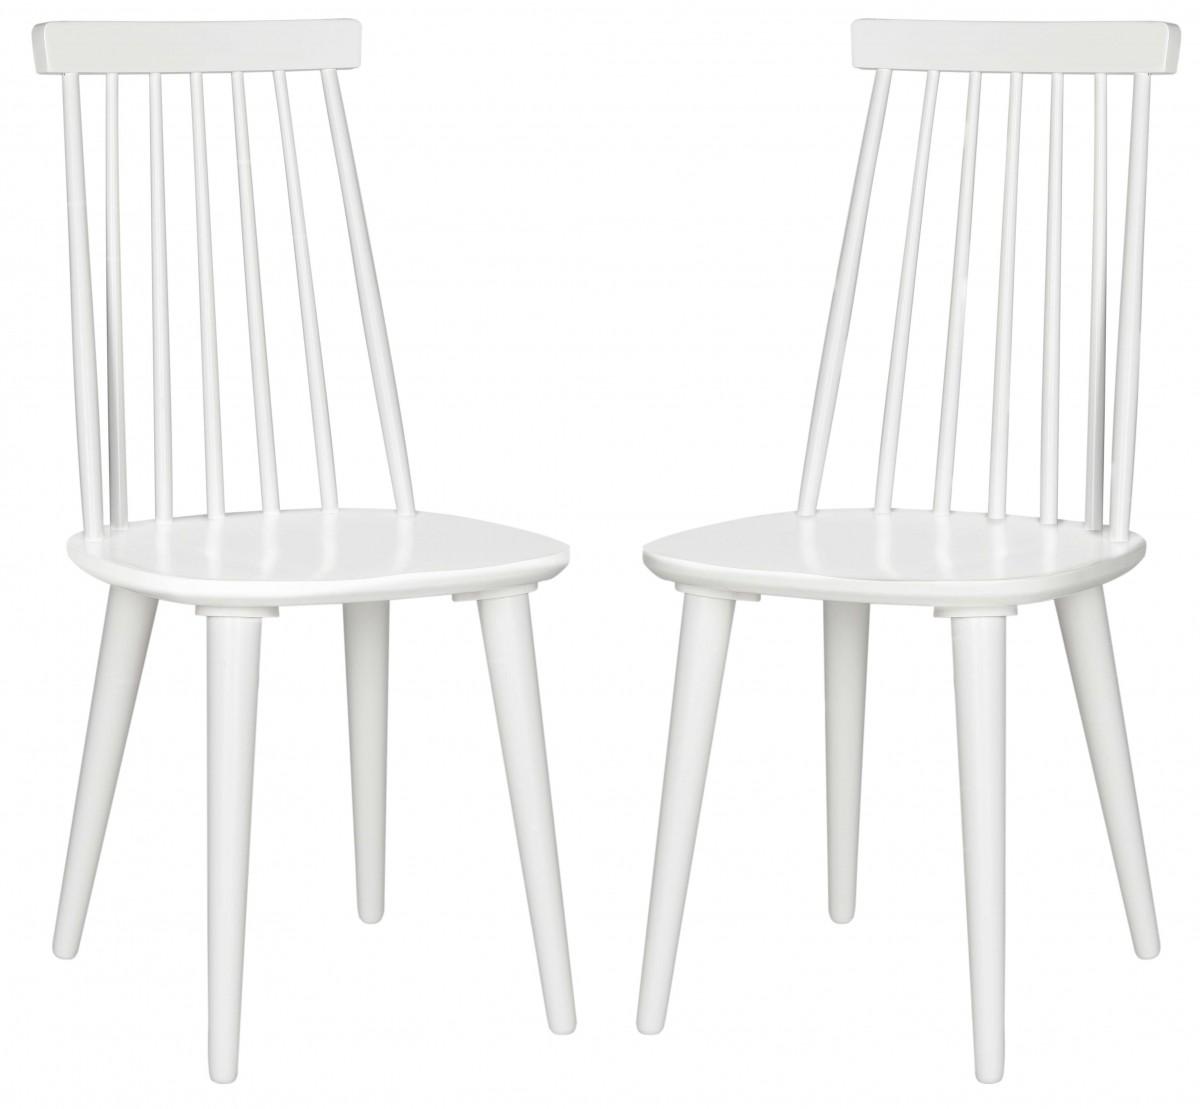 Safavieh Burris White Dining Chair - Set Of 2